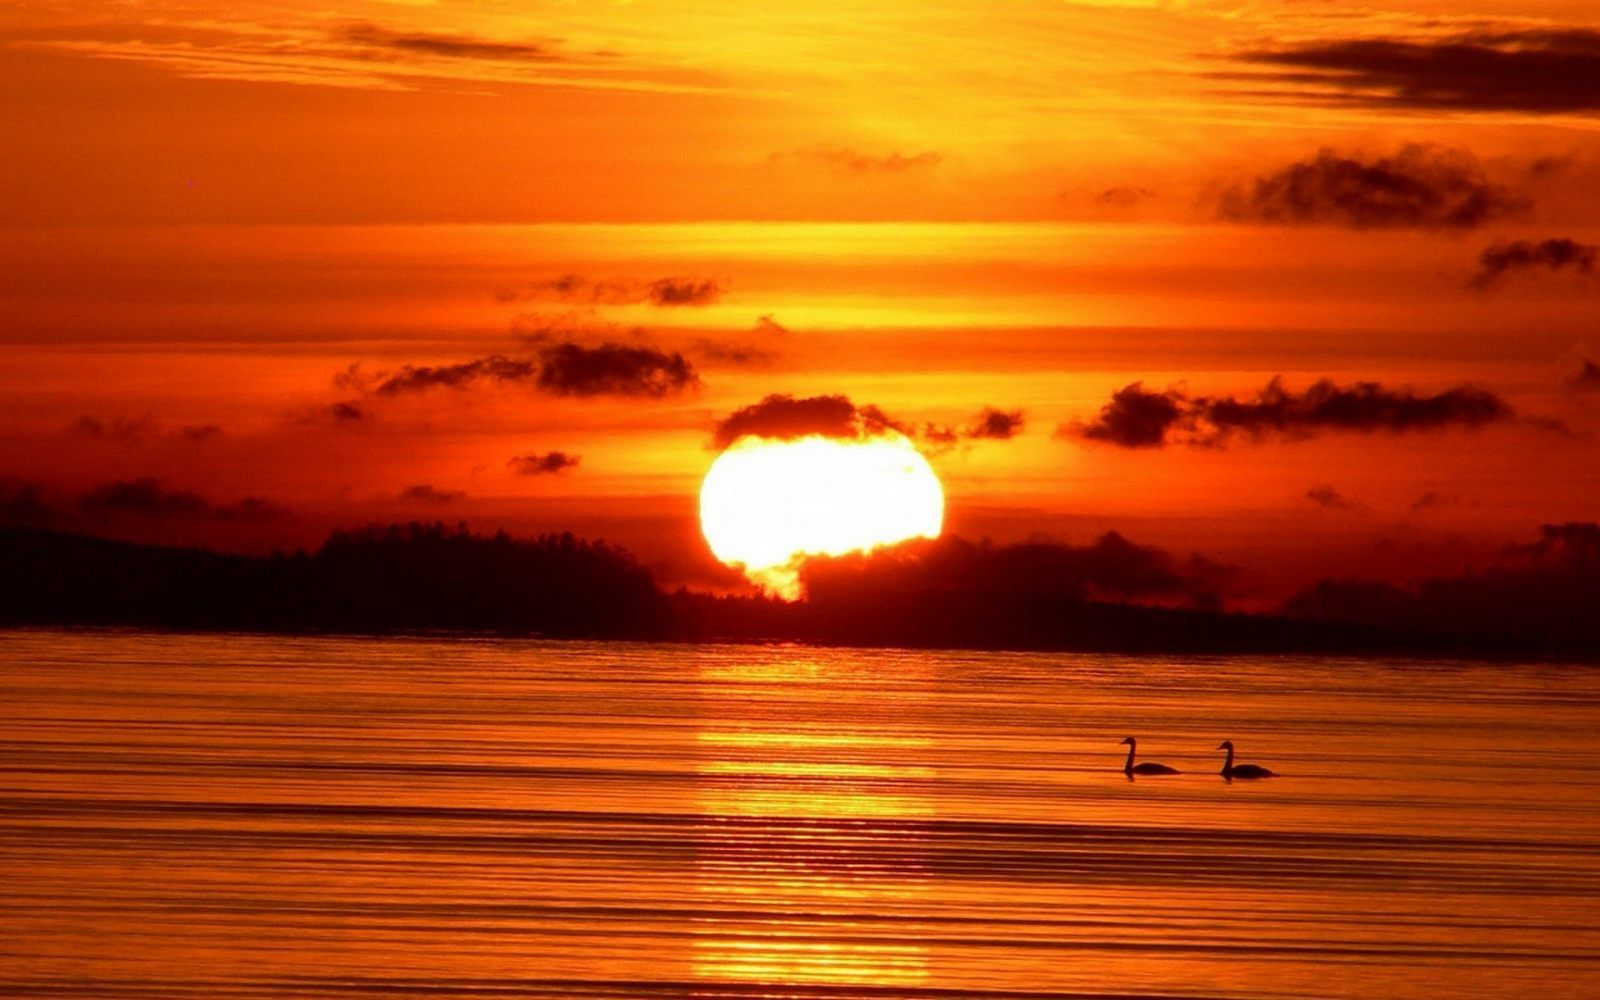 Sunset | QT'sFolder#4 ! | Sunset wallpaper, Sunset quotes